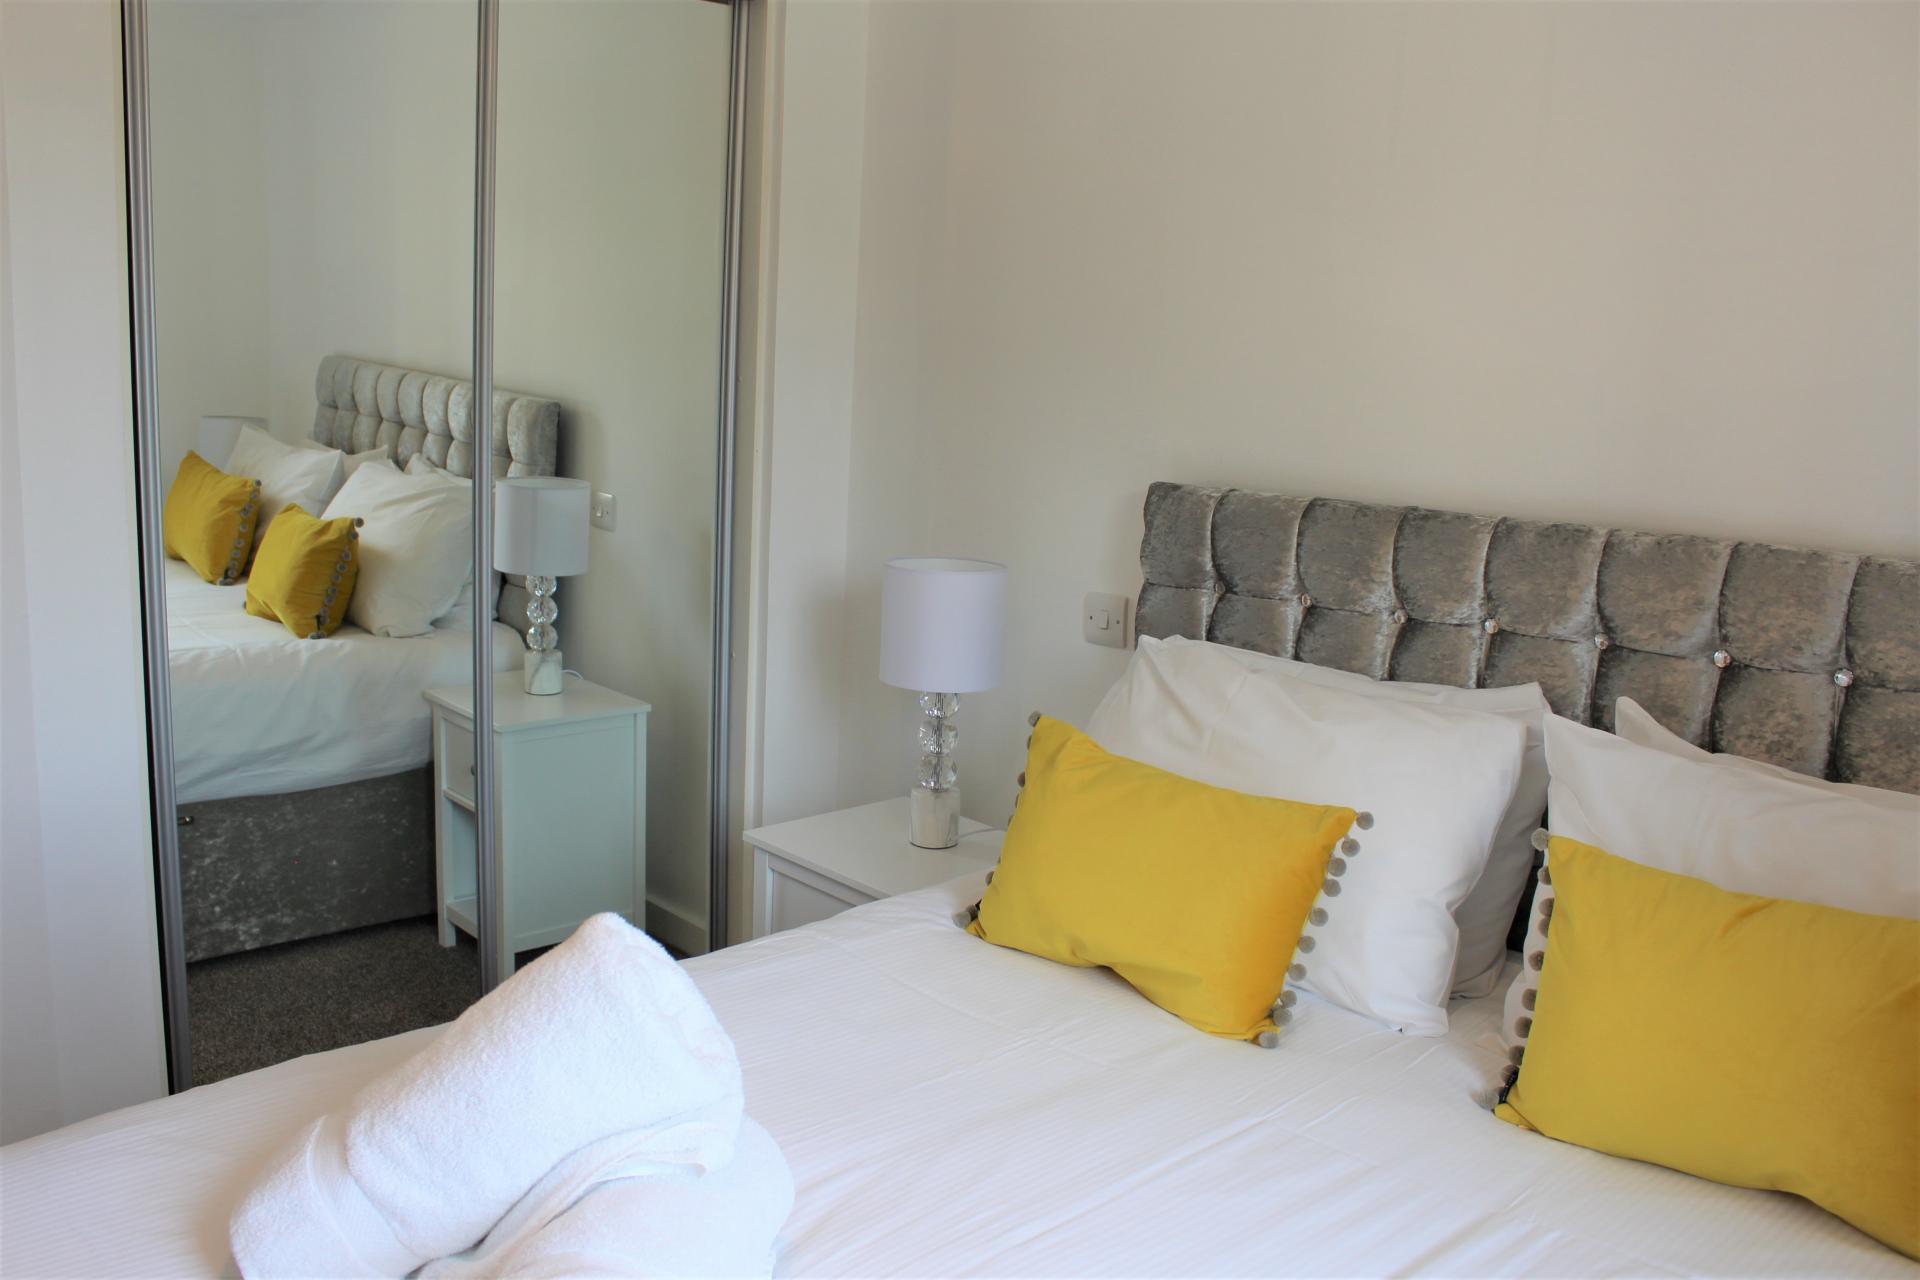 Bedding at Gunwharf Quays Apartments, Gunwharf Quays, Portsmouth